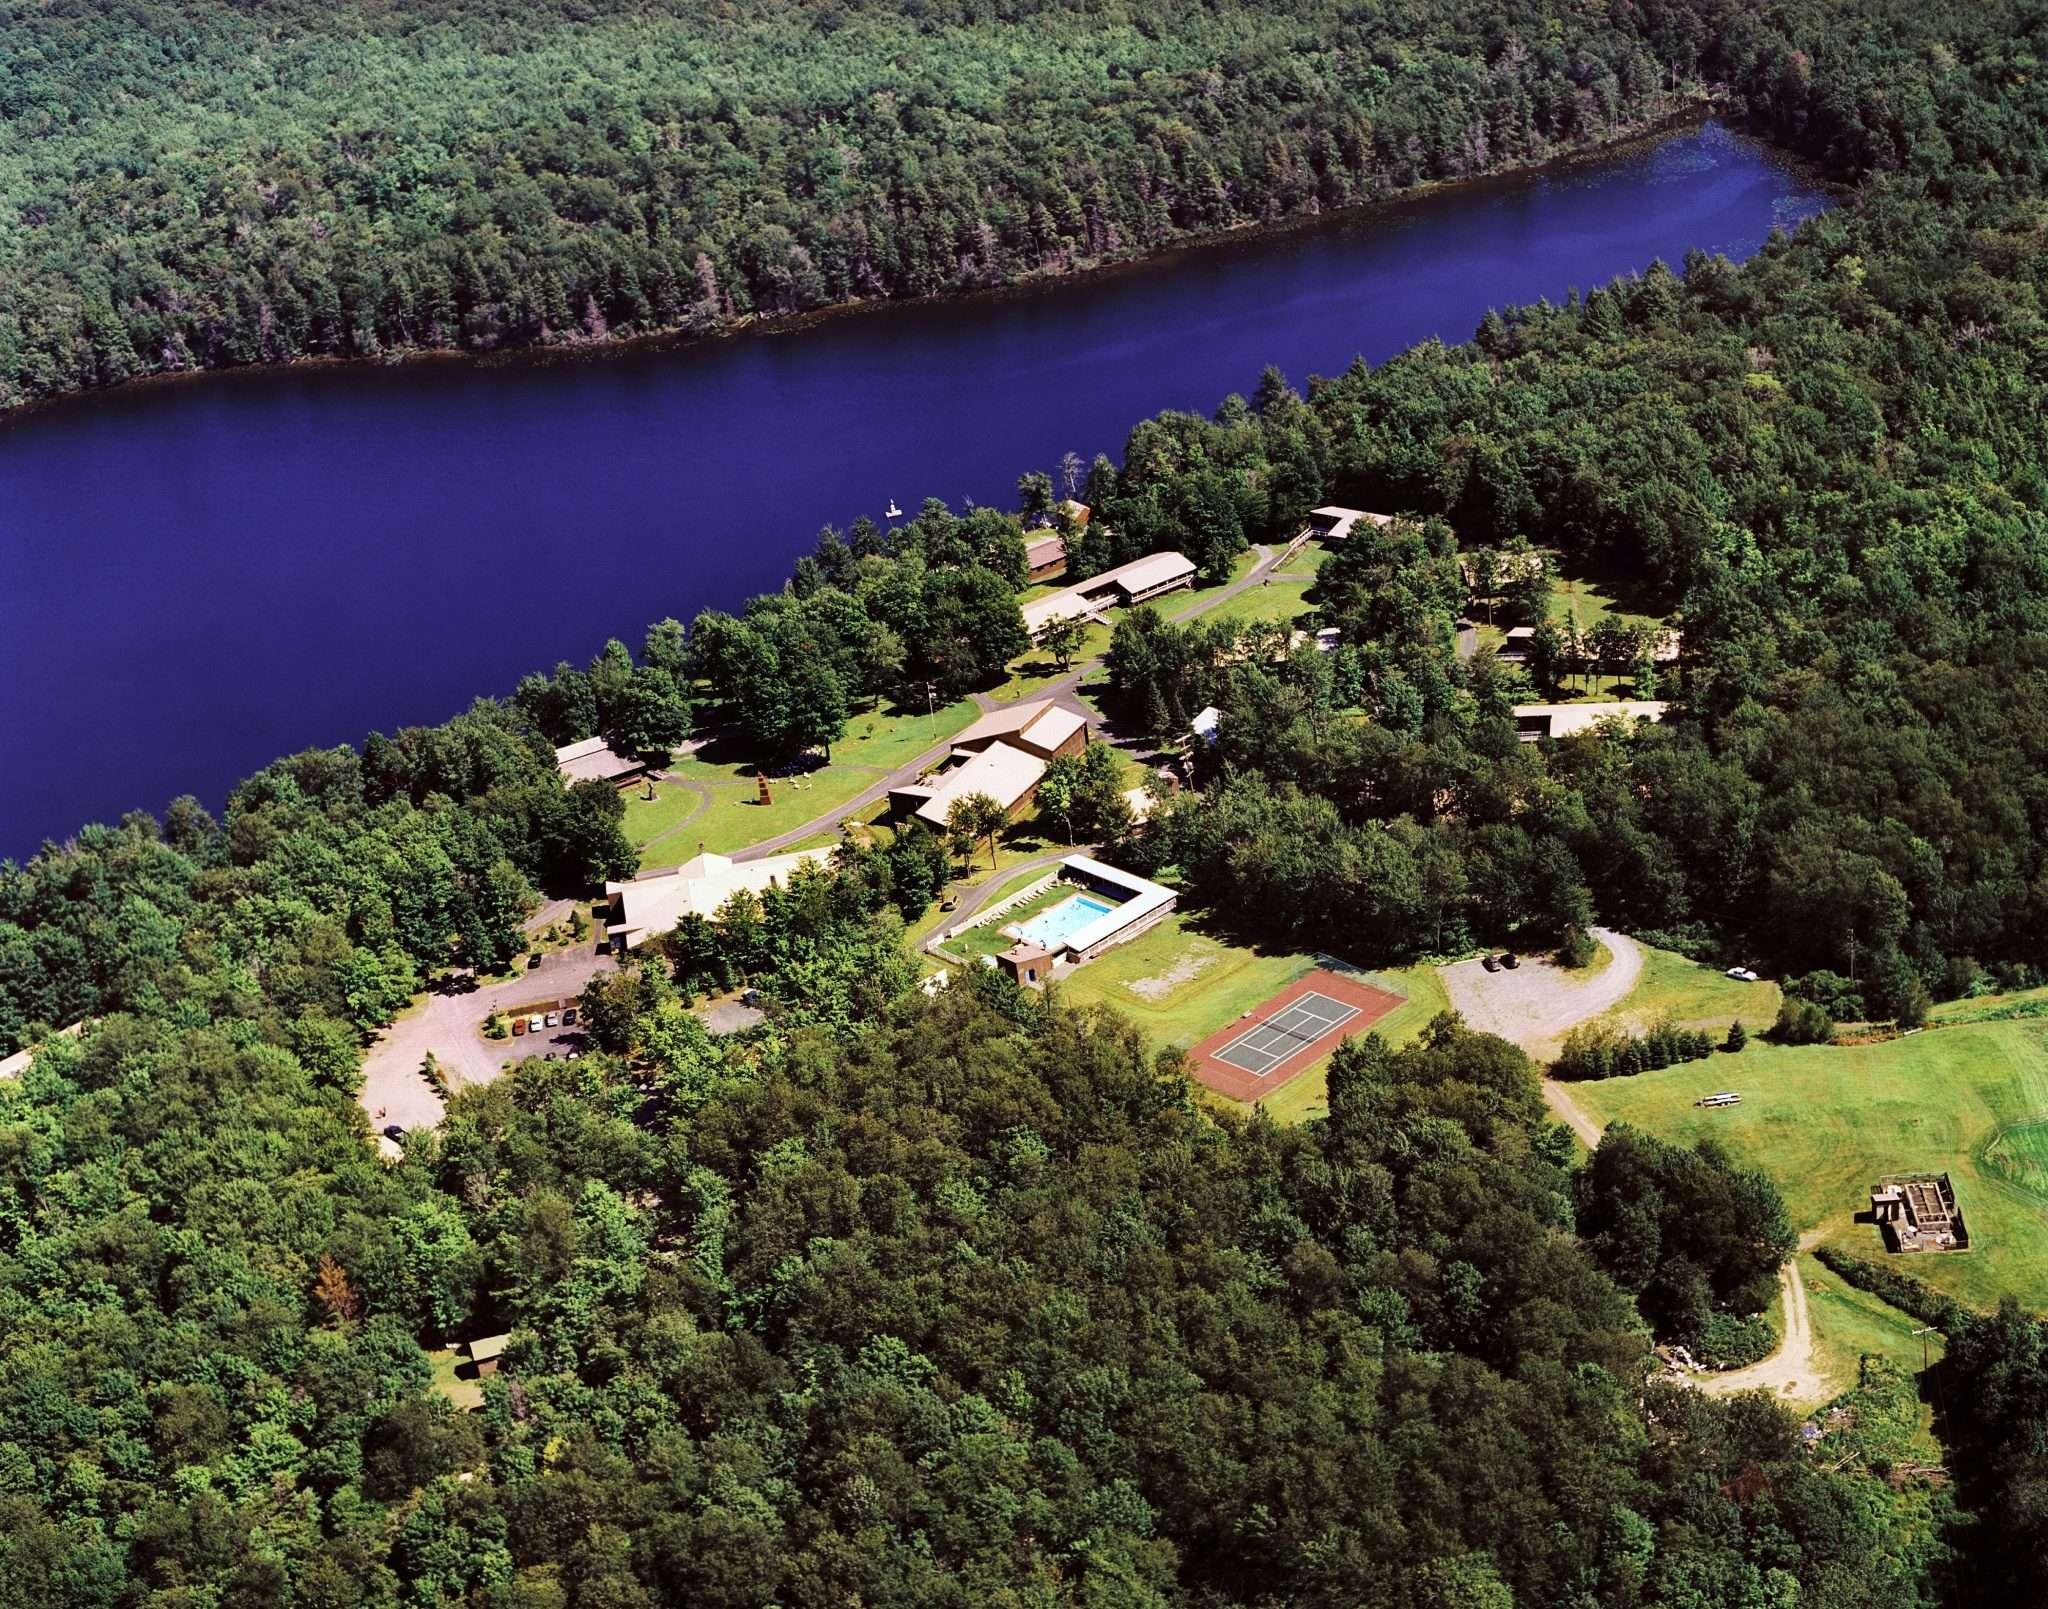 Camp Zeke Retreat Center